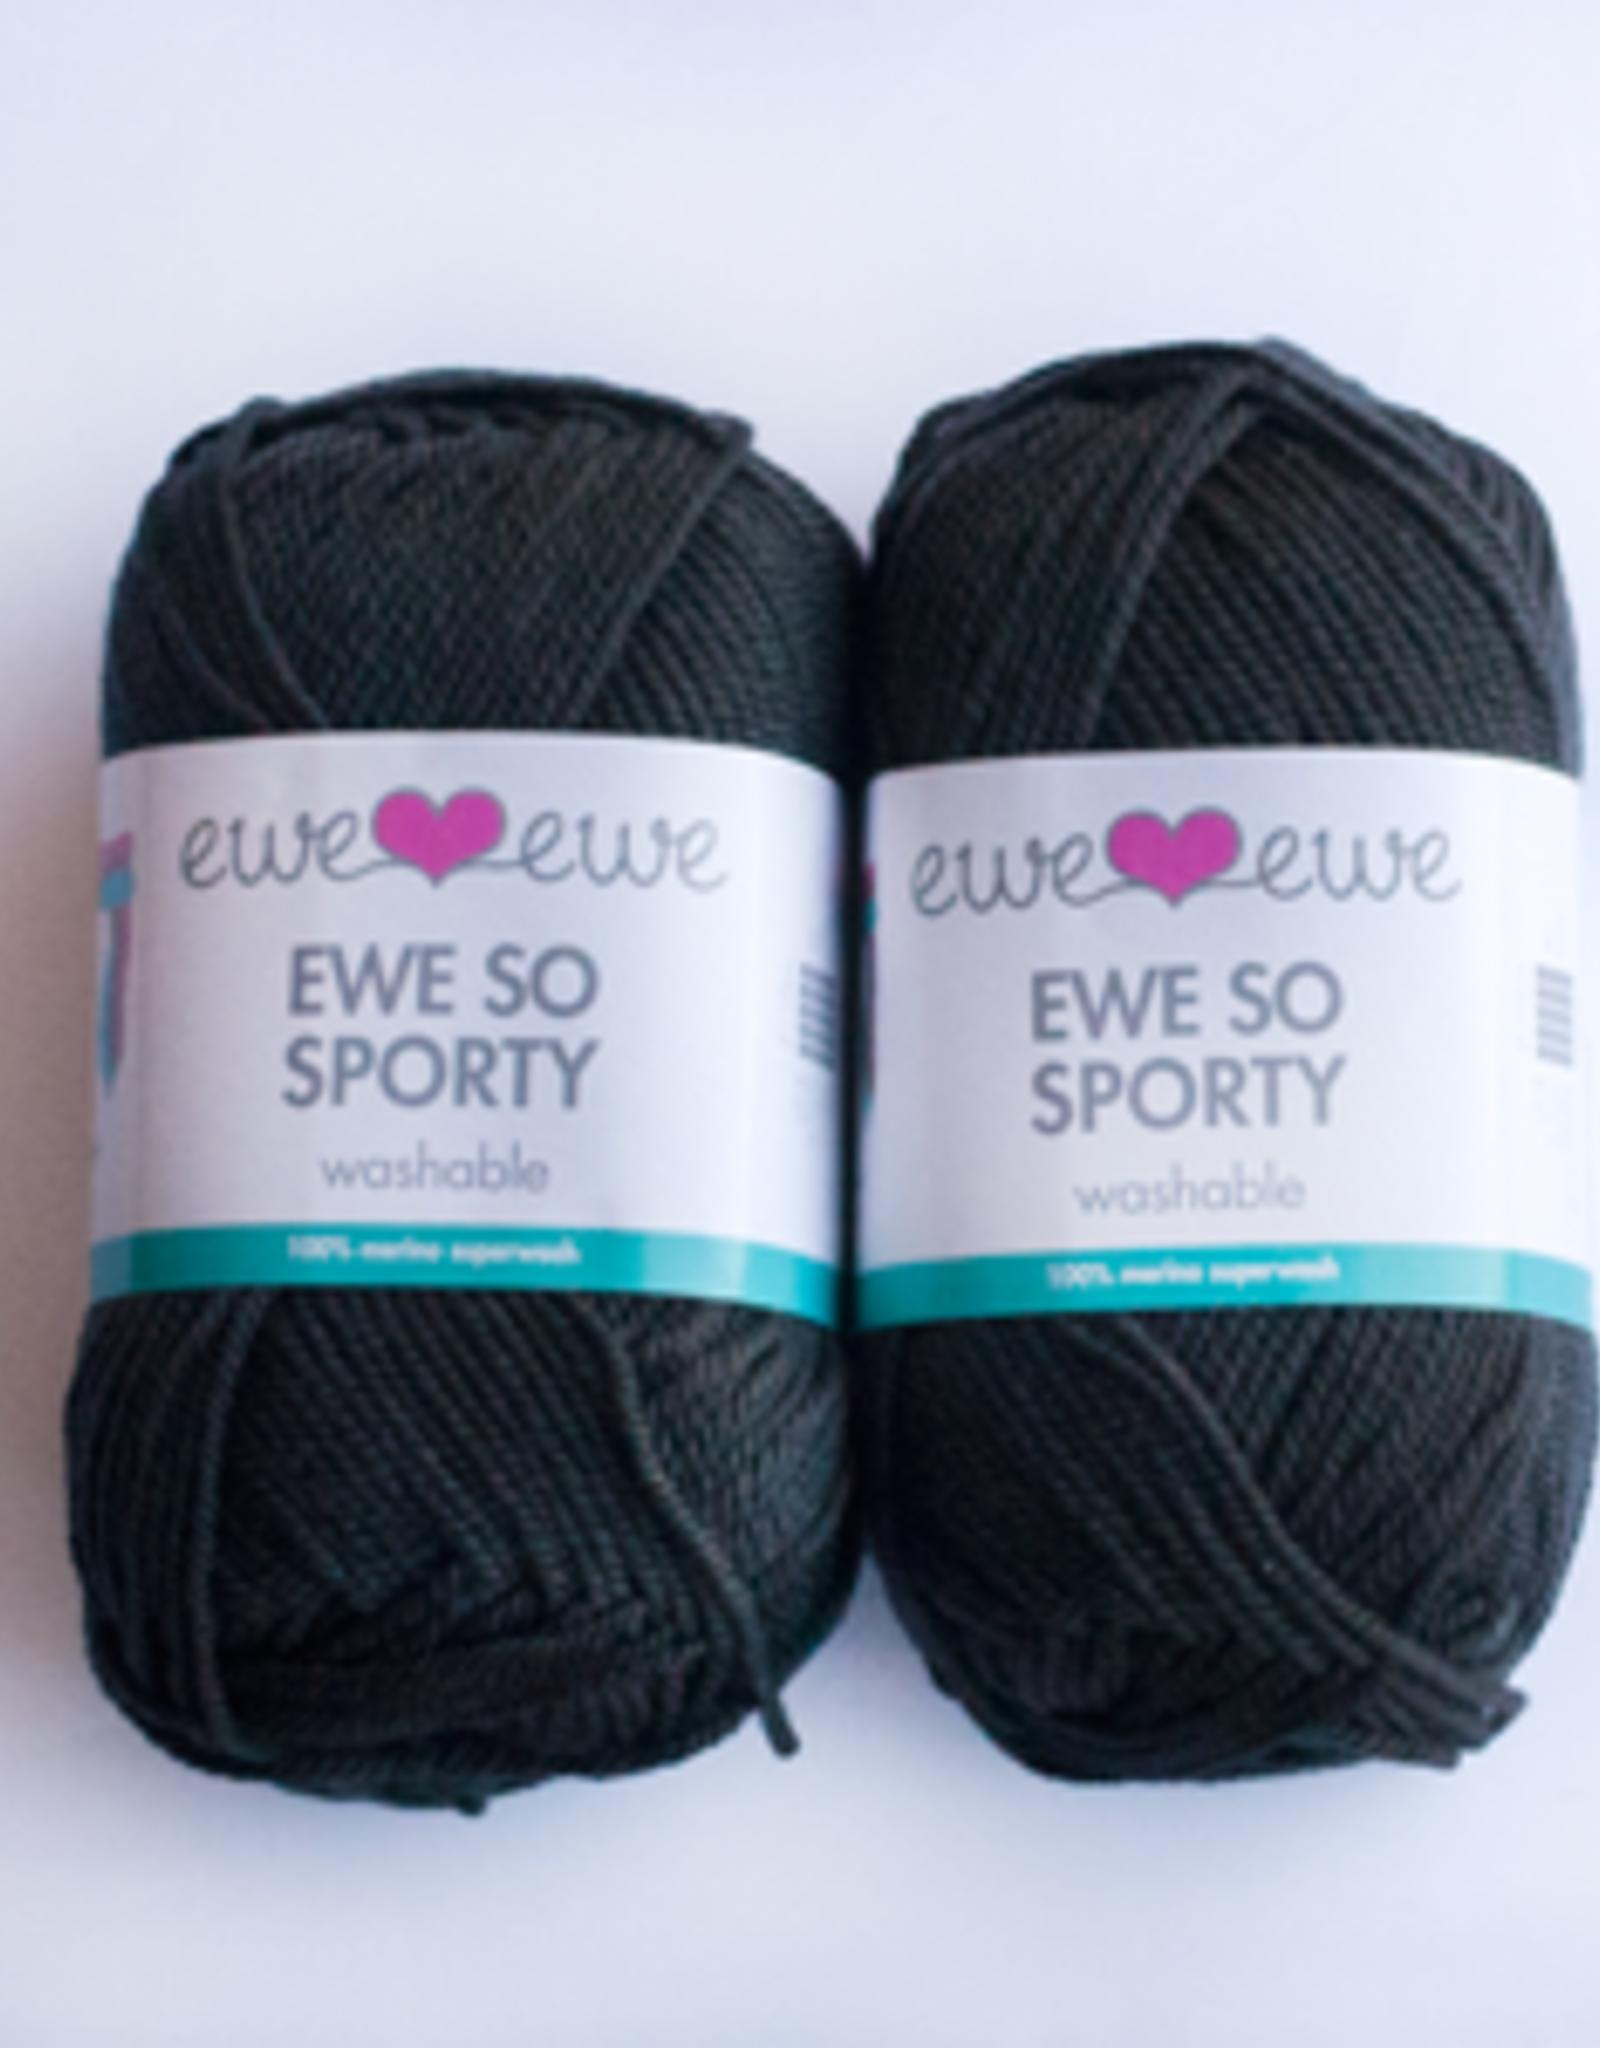 Ewe Ewe Ewe So Sporty by Ewe Ewe Yarns Color Group 1